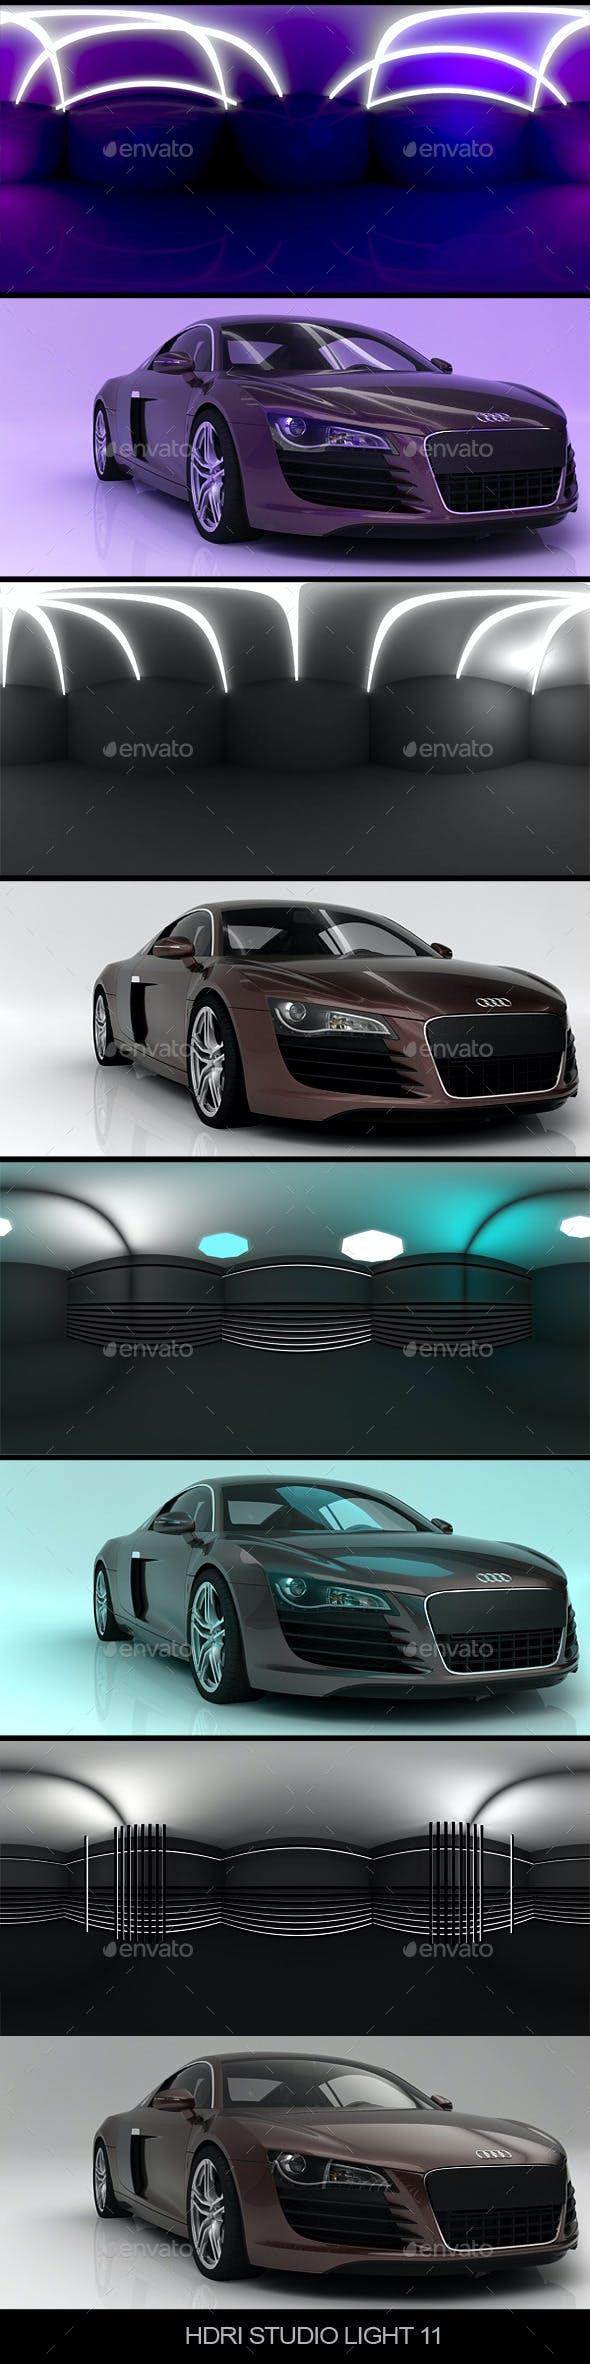 Studio light 11 - 3DOcean Item for Sale